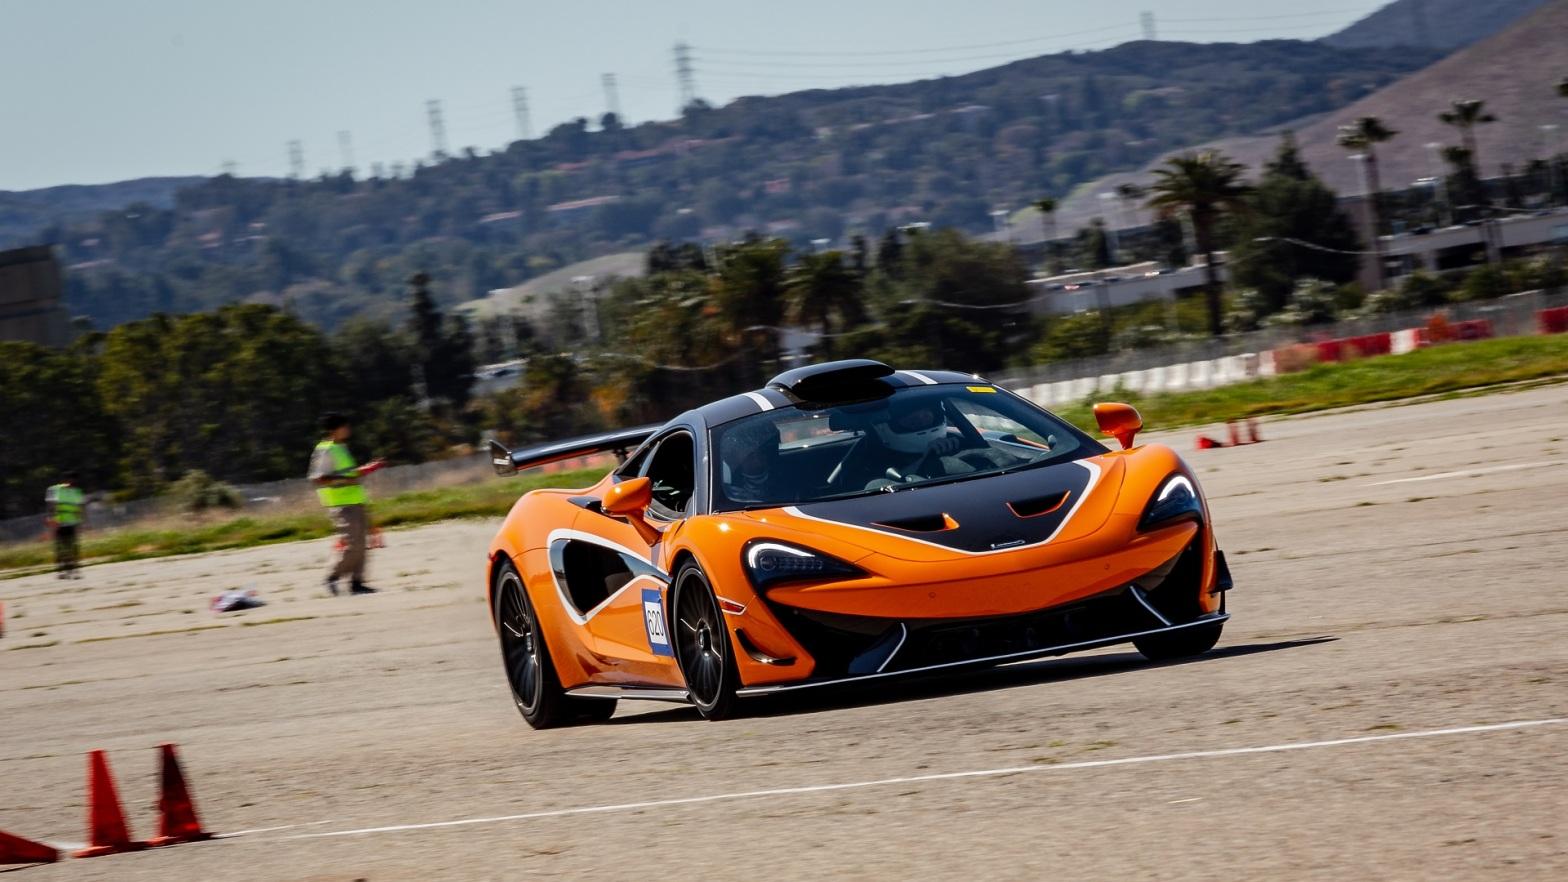 2021 McLaren 620R autocross